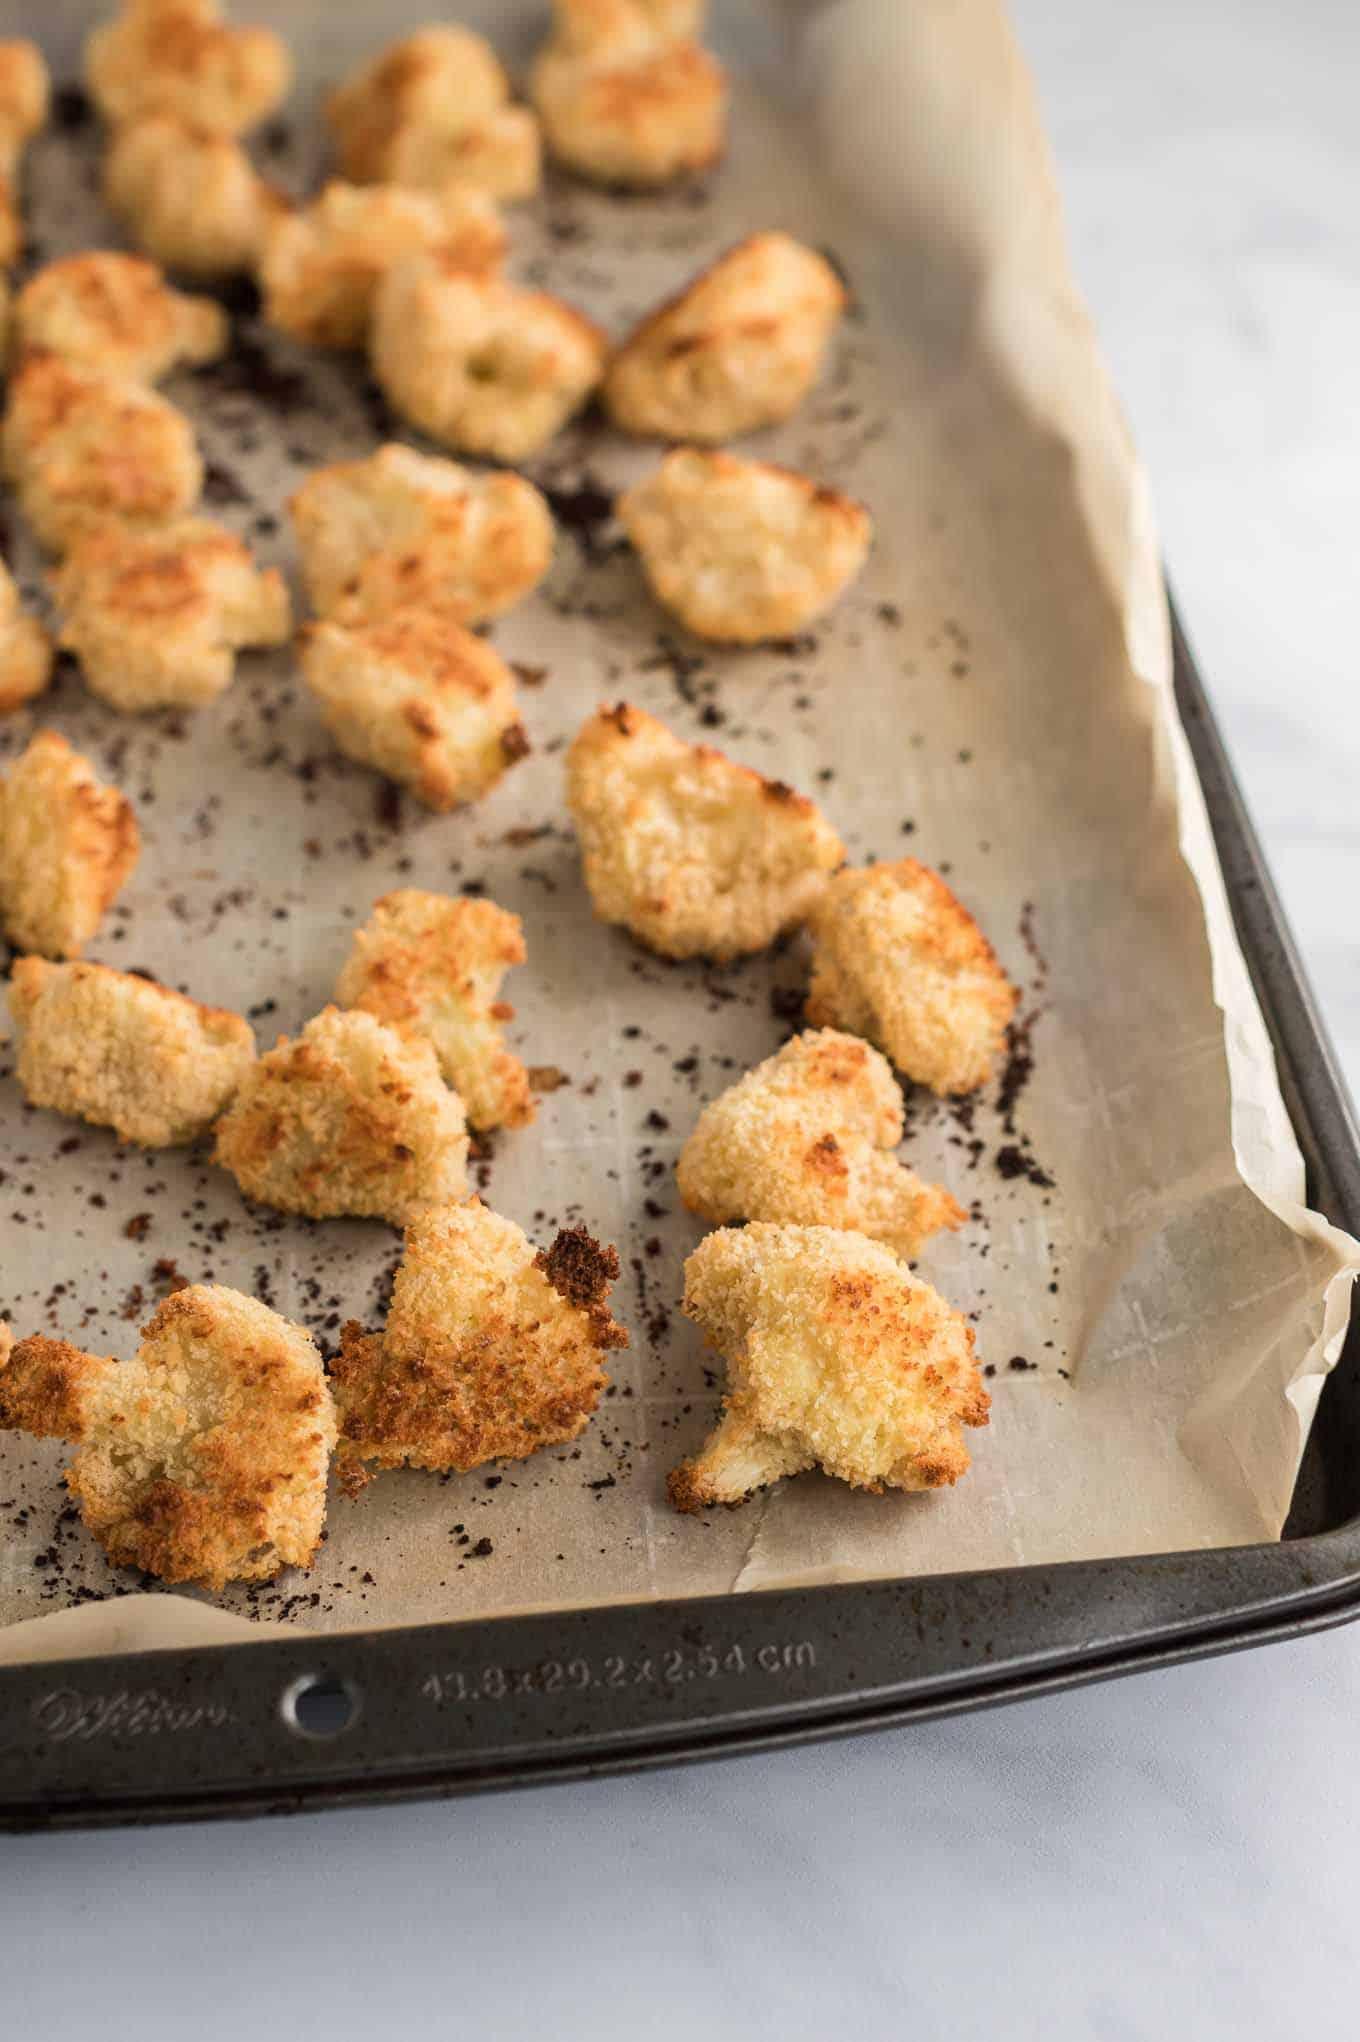 the cooked crispy cauliflower bites on the baking sheet